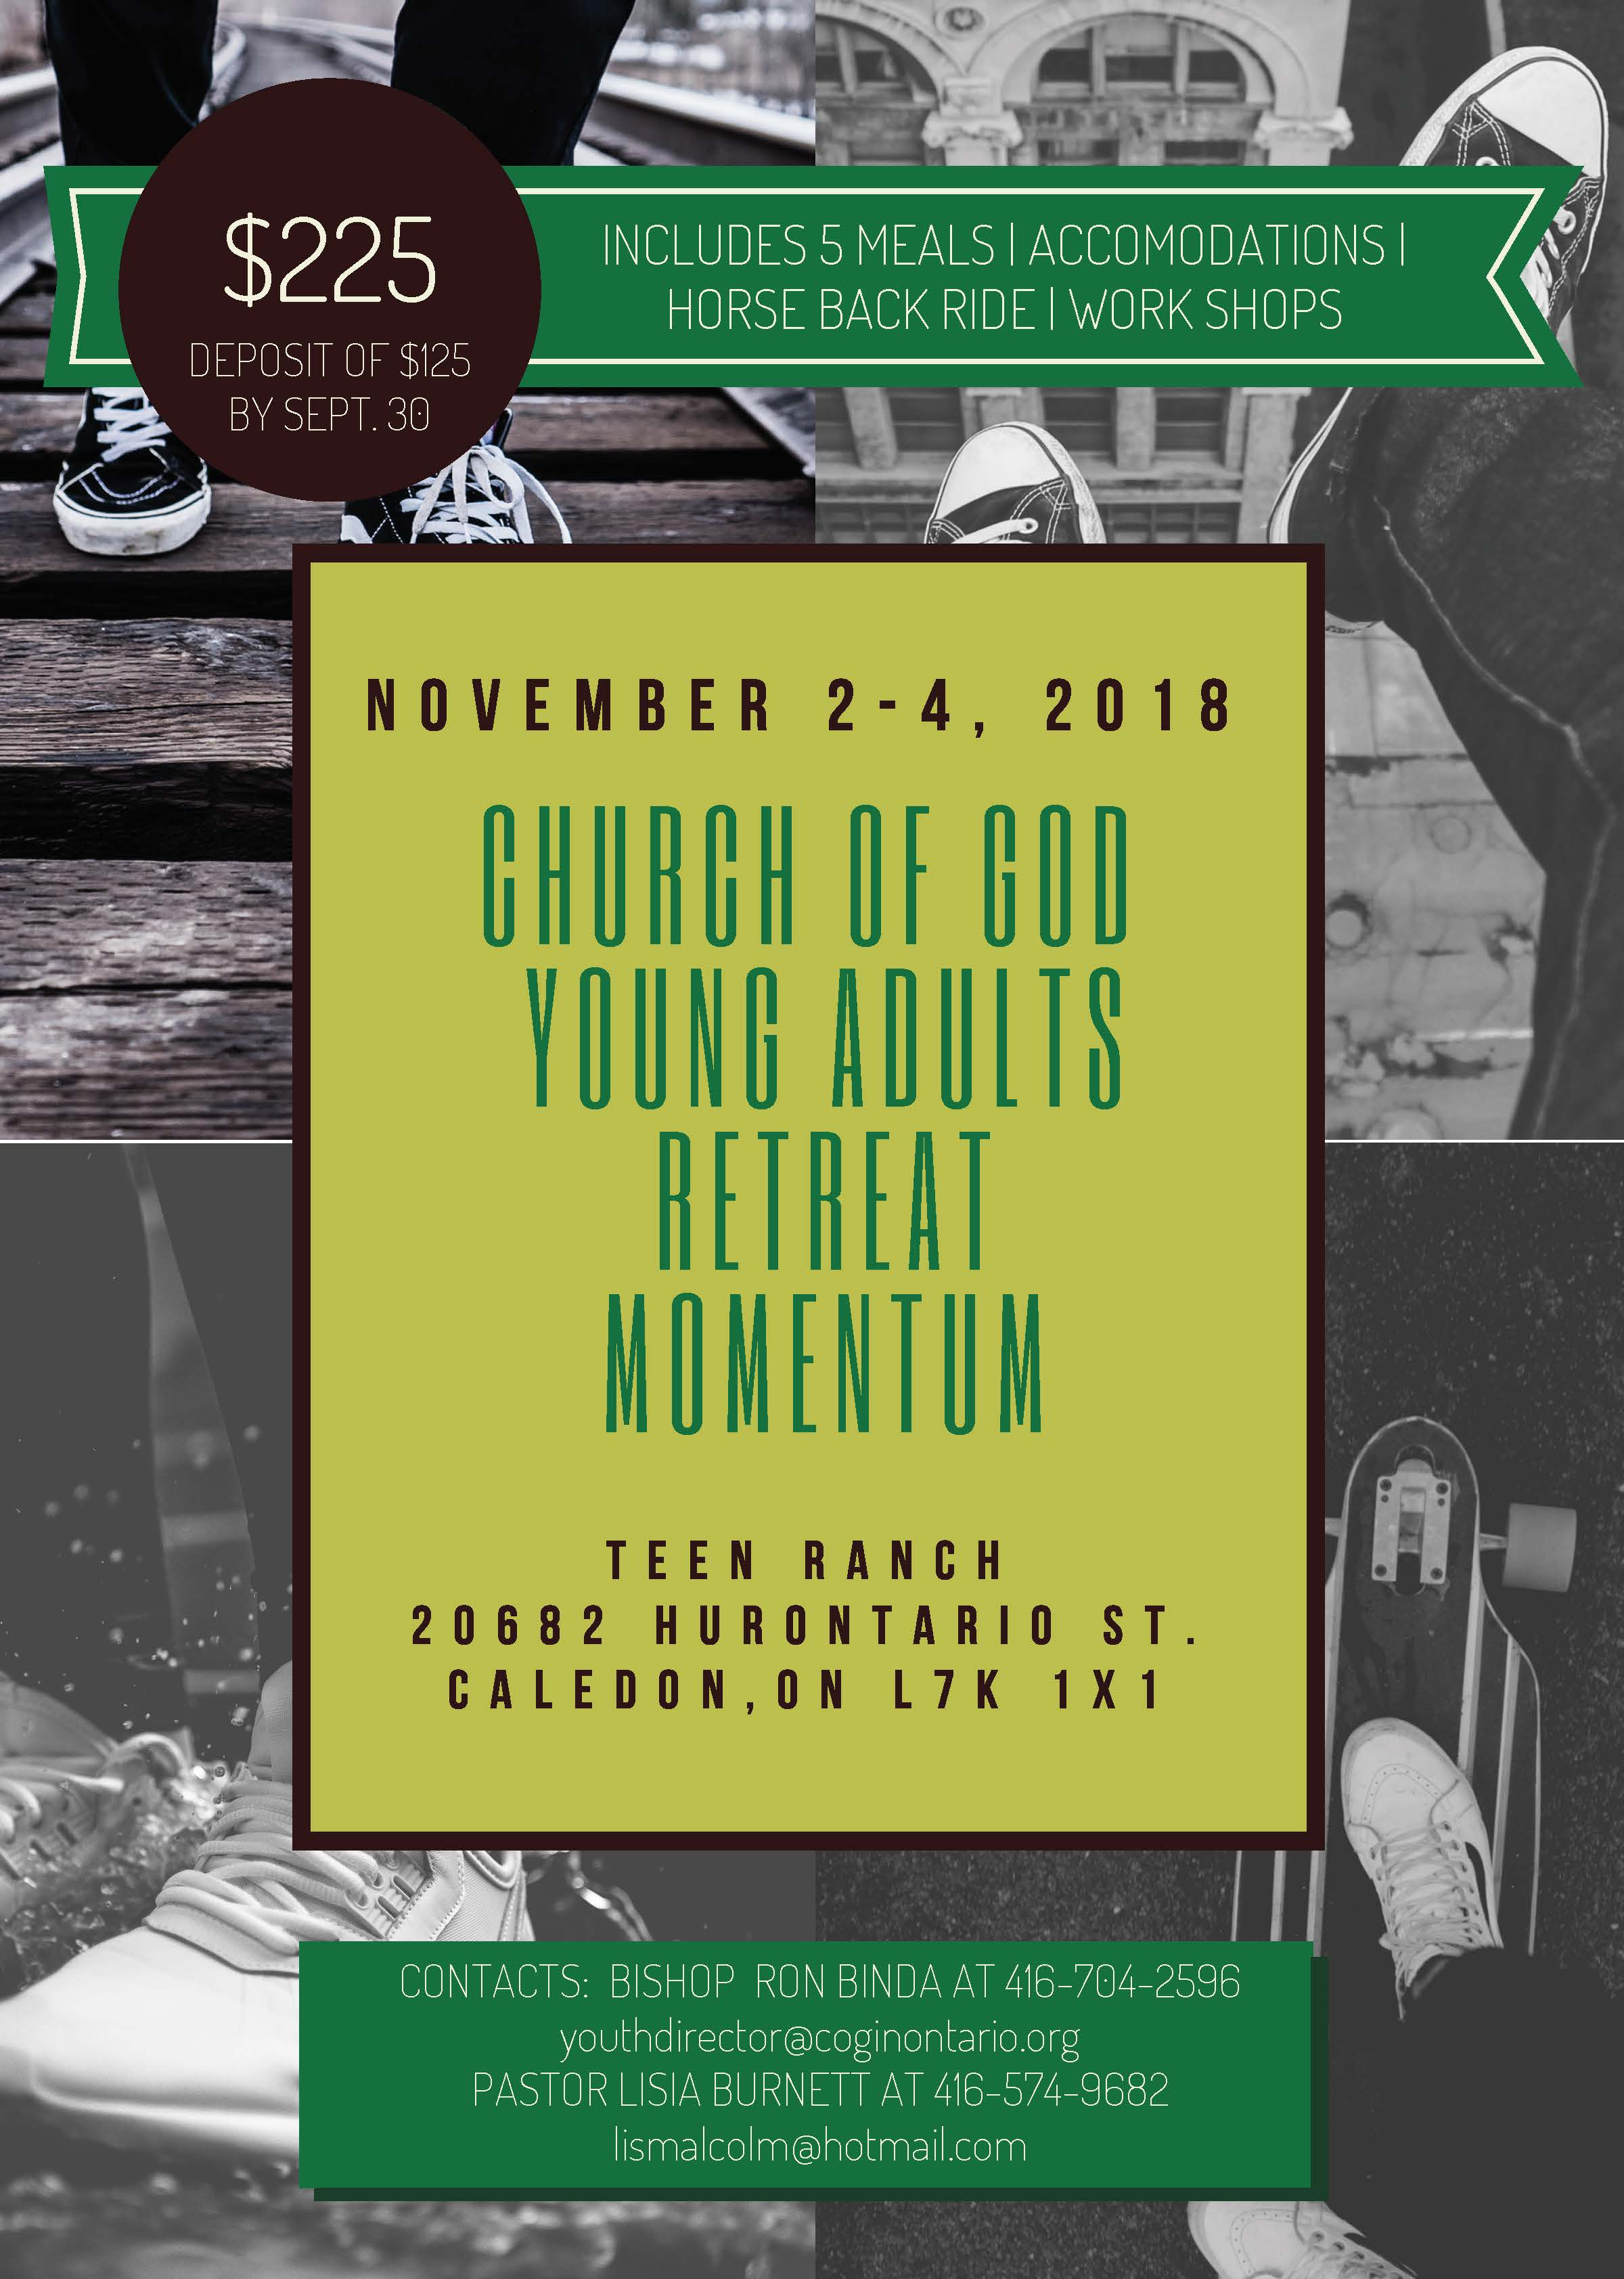 2018 Retreat - Young Adults Retreat Flyer.jpg